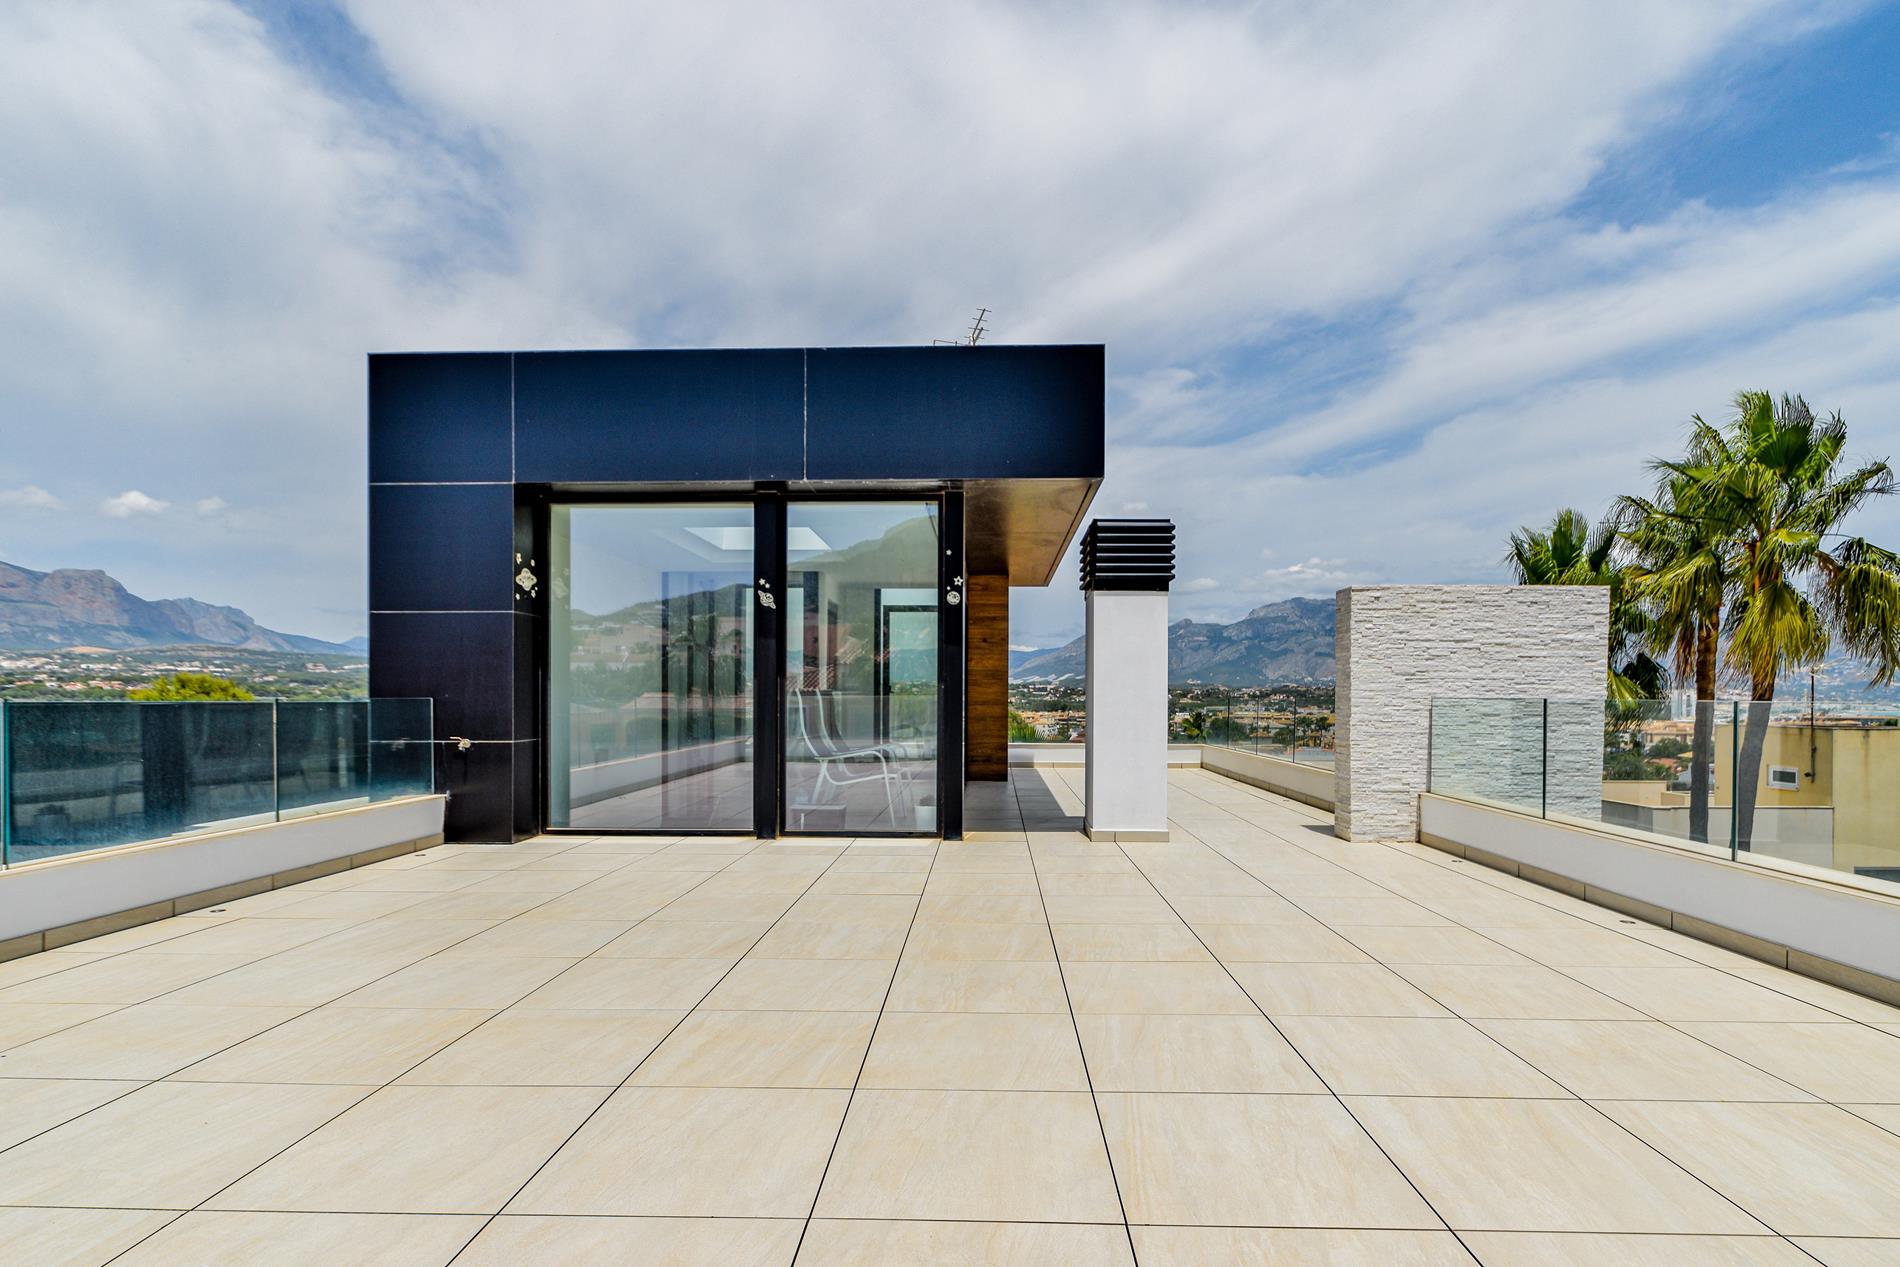 Chalet | Villa en venta en Albir de estilo moderno